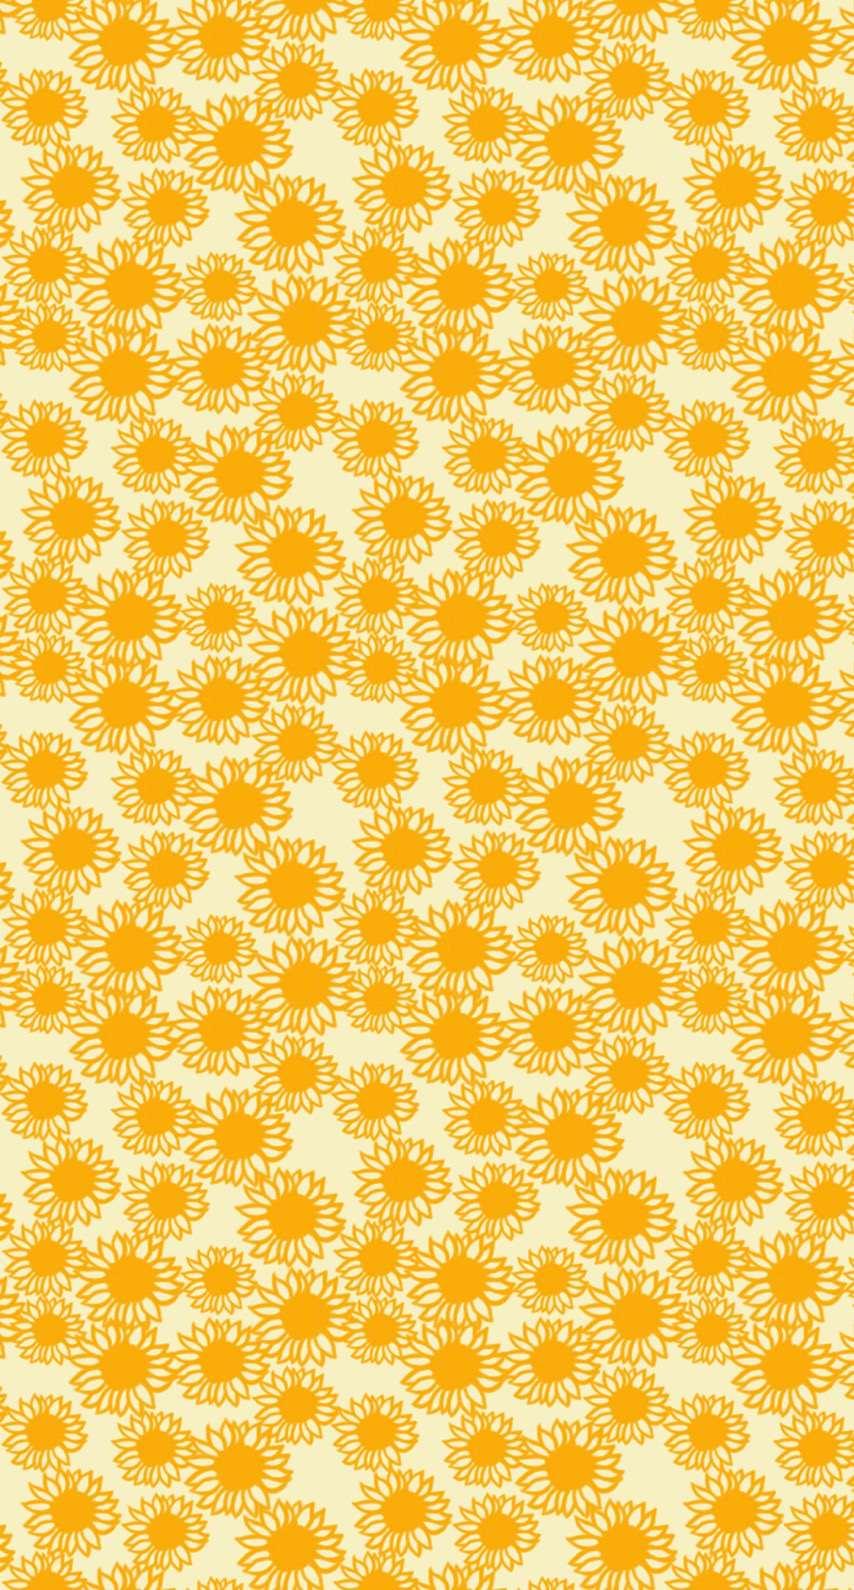 Pattern Sunflower Yellow Women Friendly Wallpaper Sc Iphone8